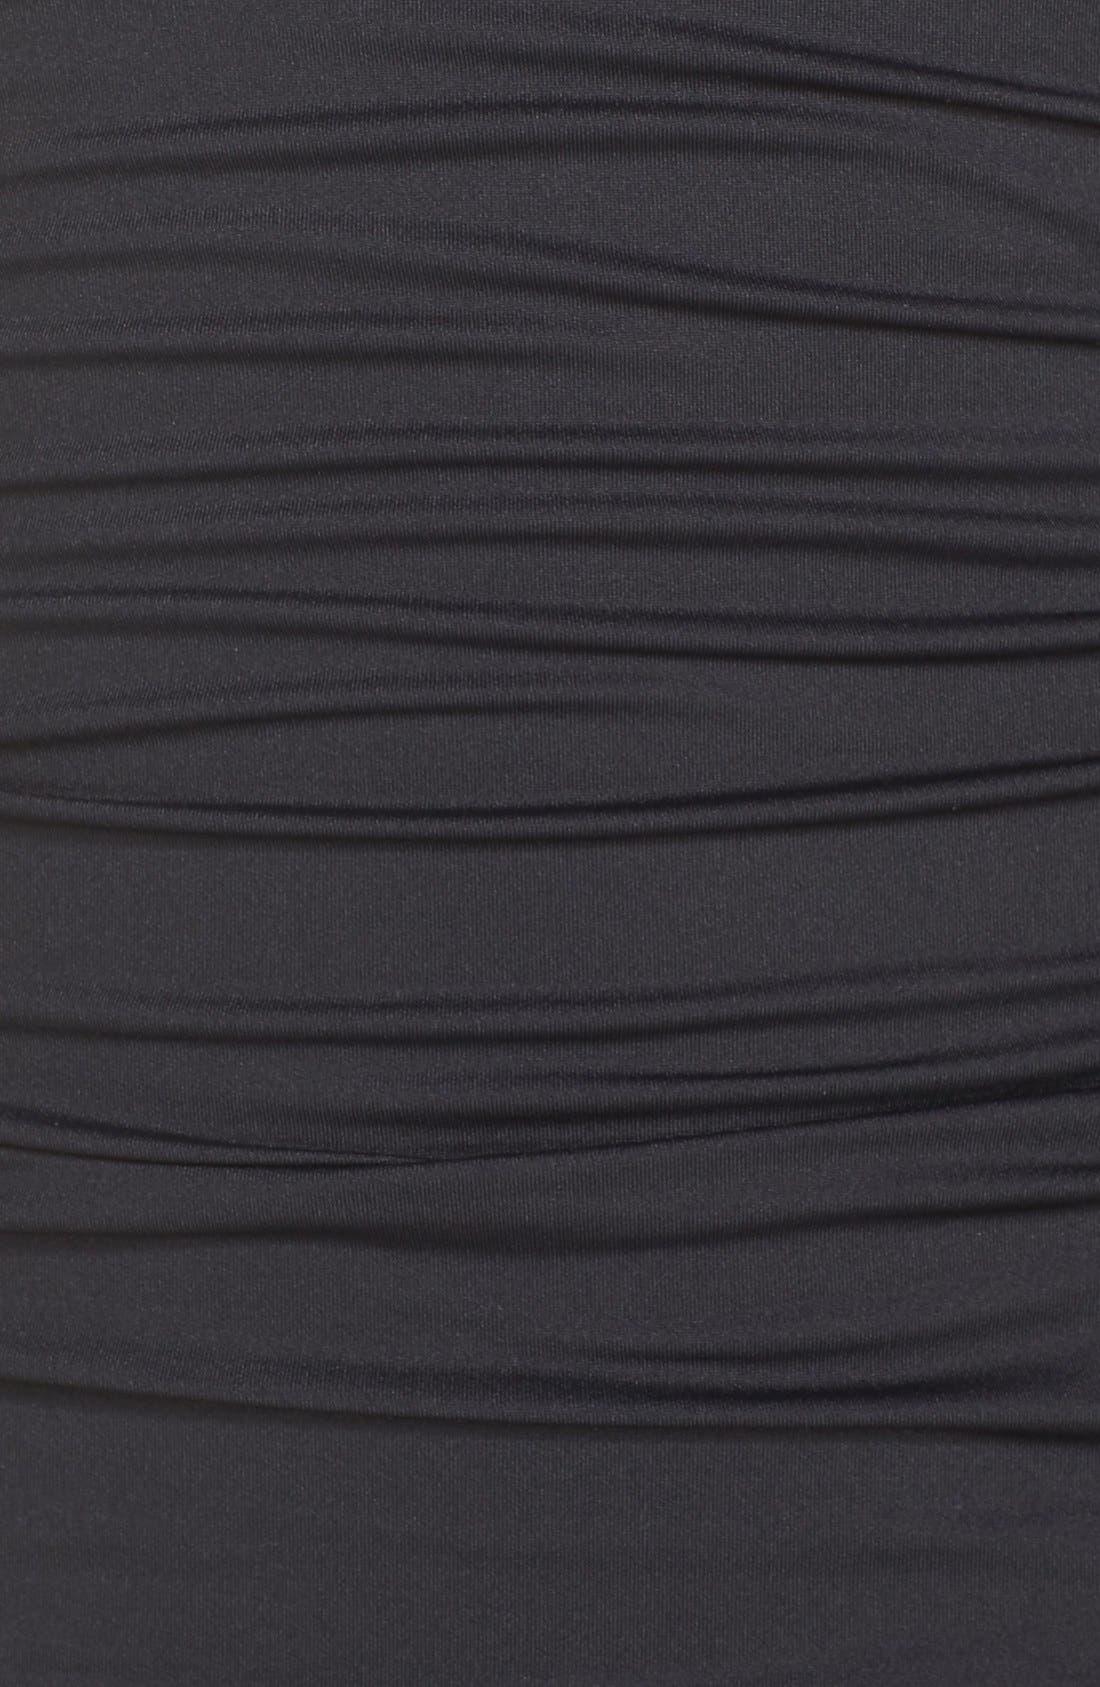 LA BLANCA, Island Goddess One-Piece Swimsuit, Alternate thumbnail 11, color, BLACK